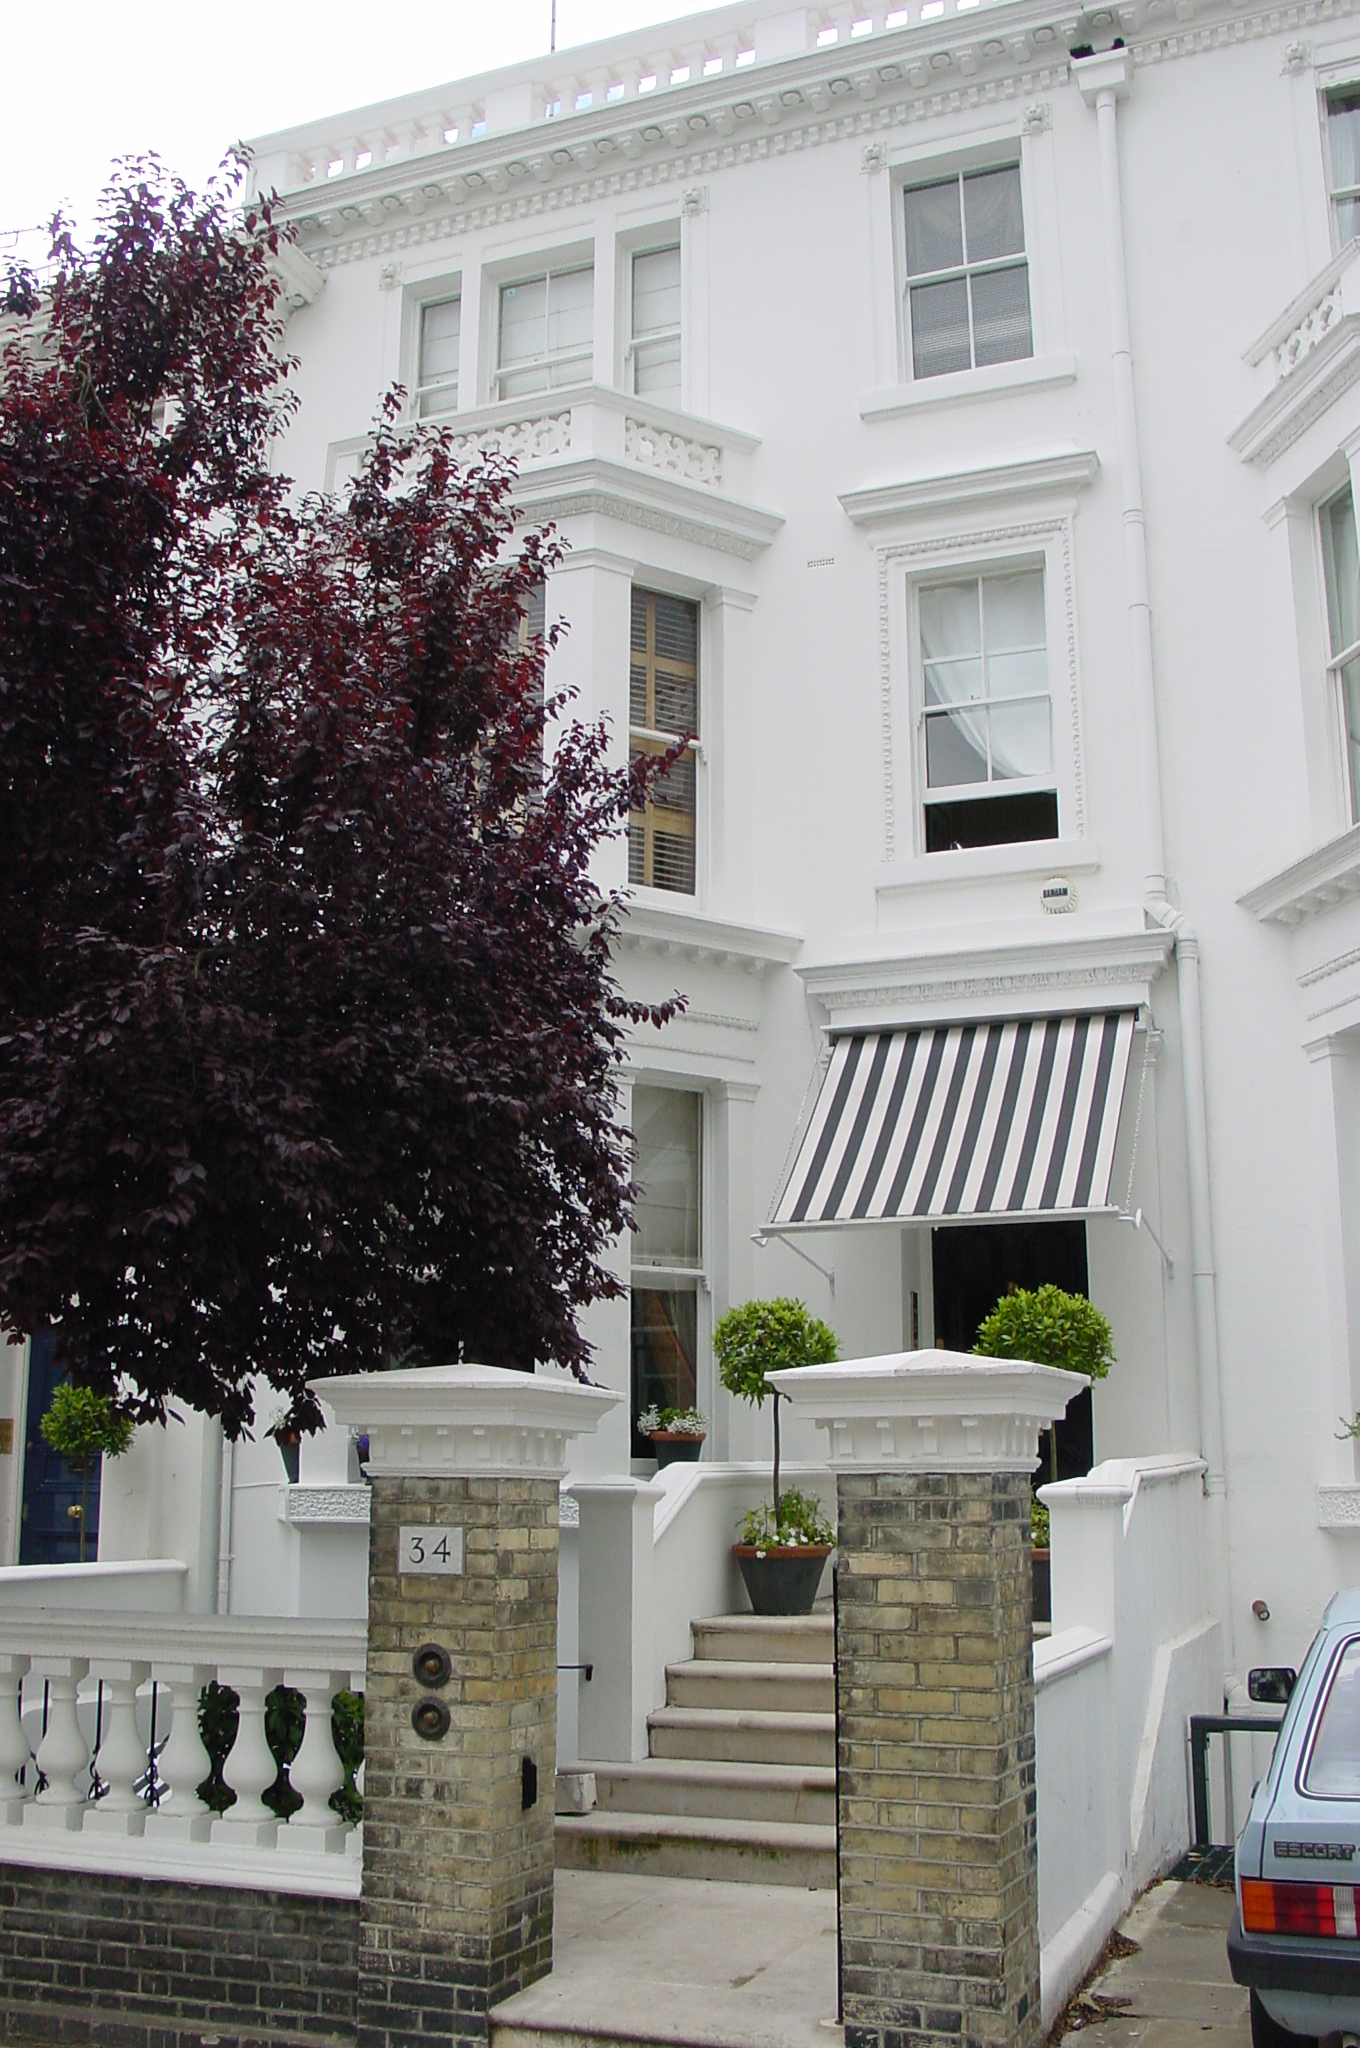 Argyll Road, Kensington